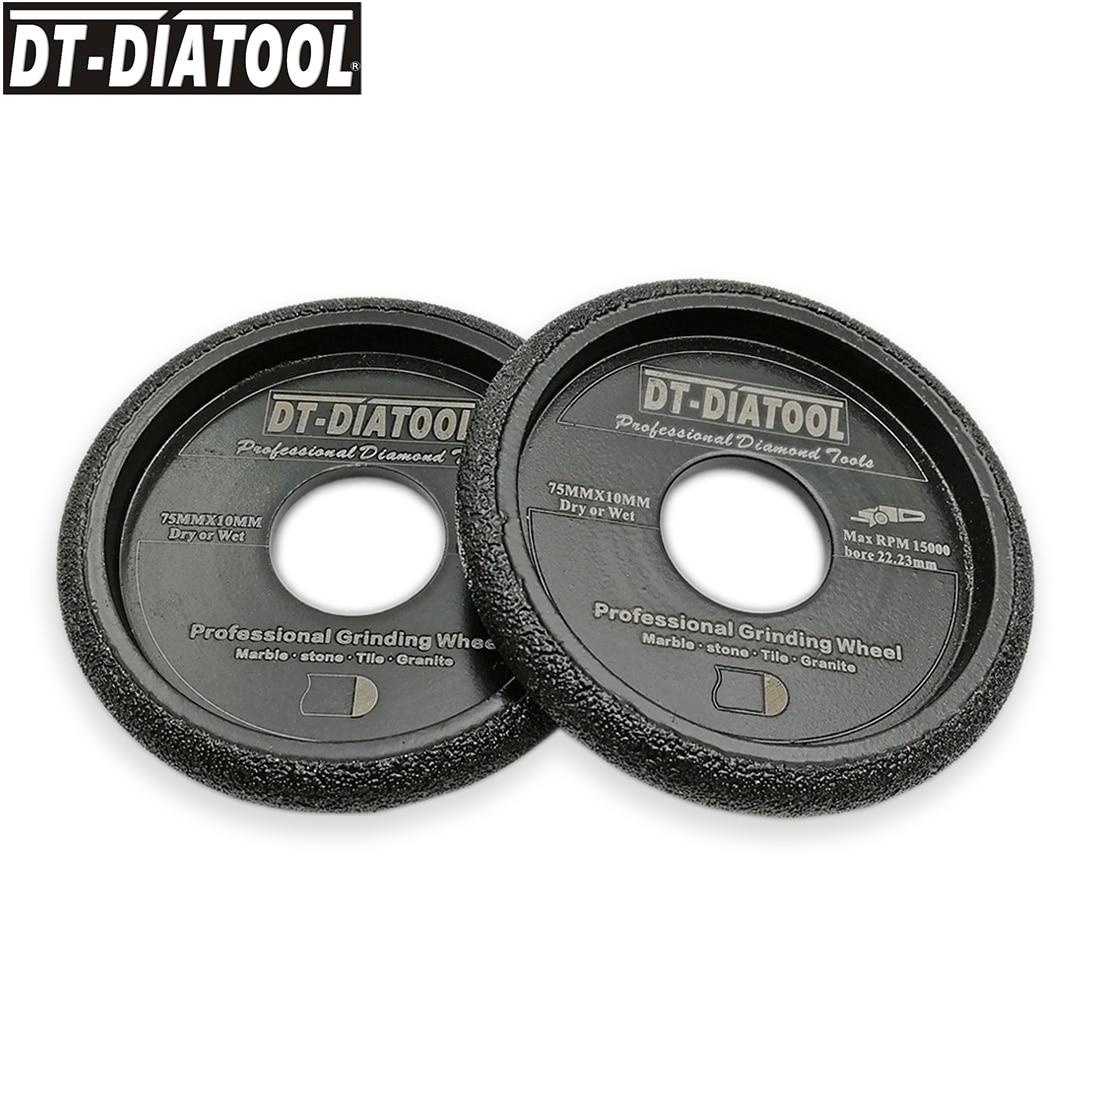 DT-DIATOOL 2pcs 75x10mm Vacuum Brazed Diamond Grinding Convex Wheel Grinding Disc Marble Granite Quartz Artificial Stone Profile